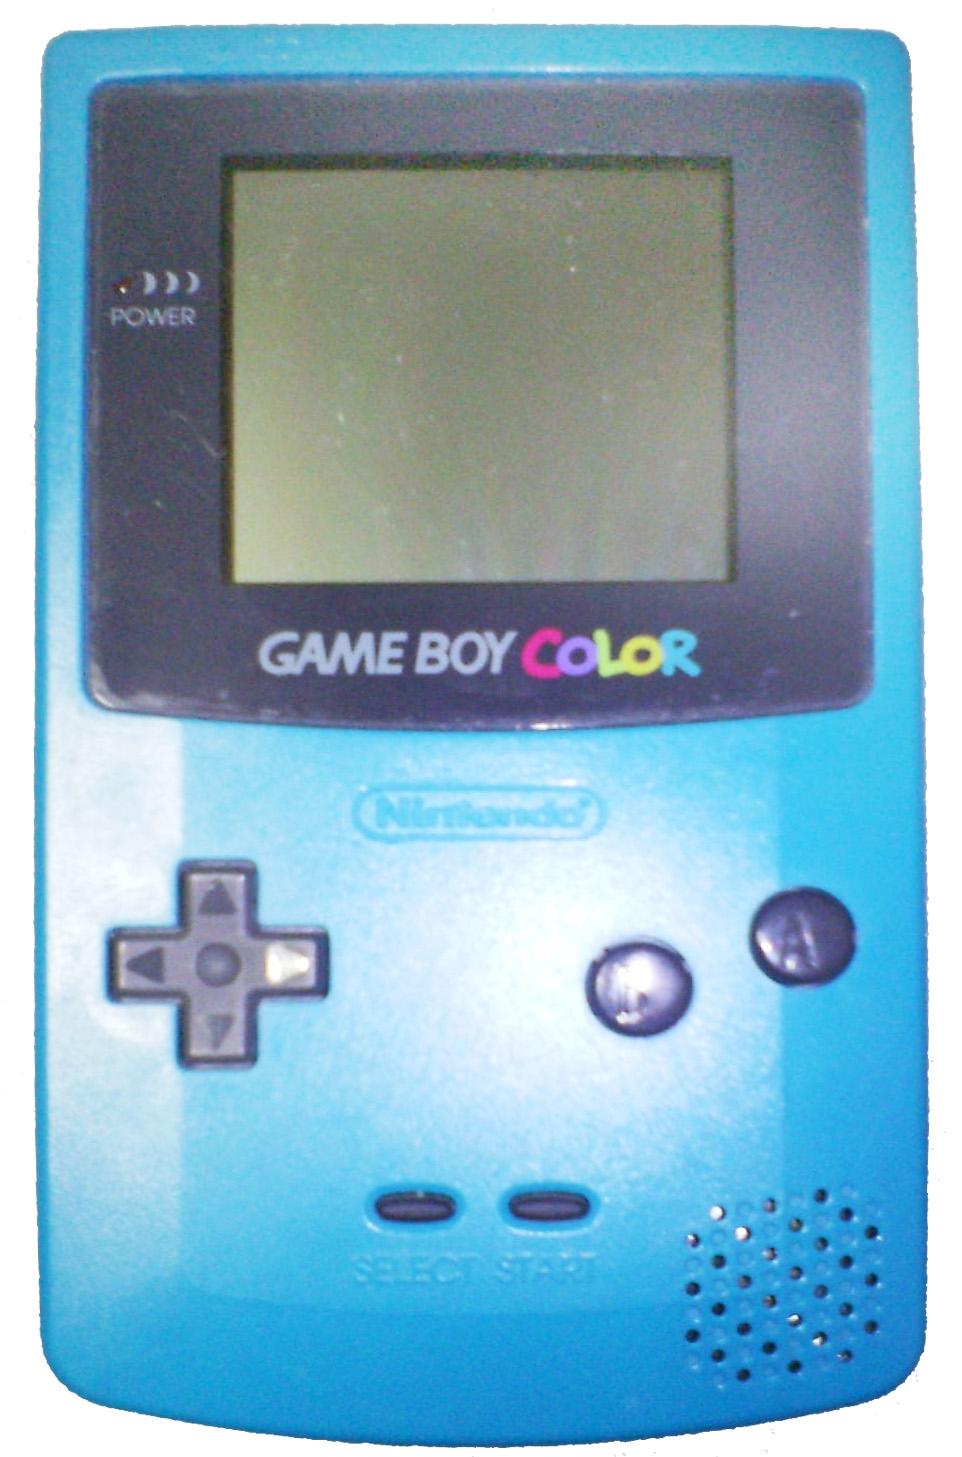 Game boy color game genie codes - Game Boy Color Gta 13